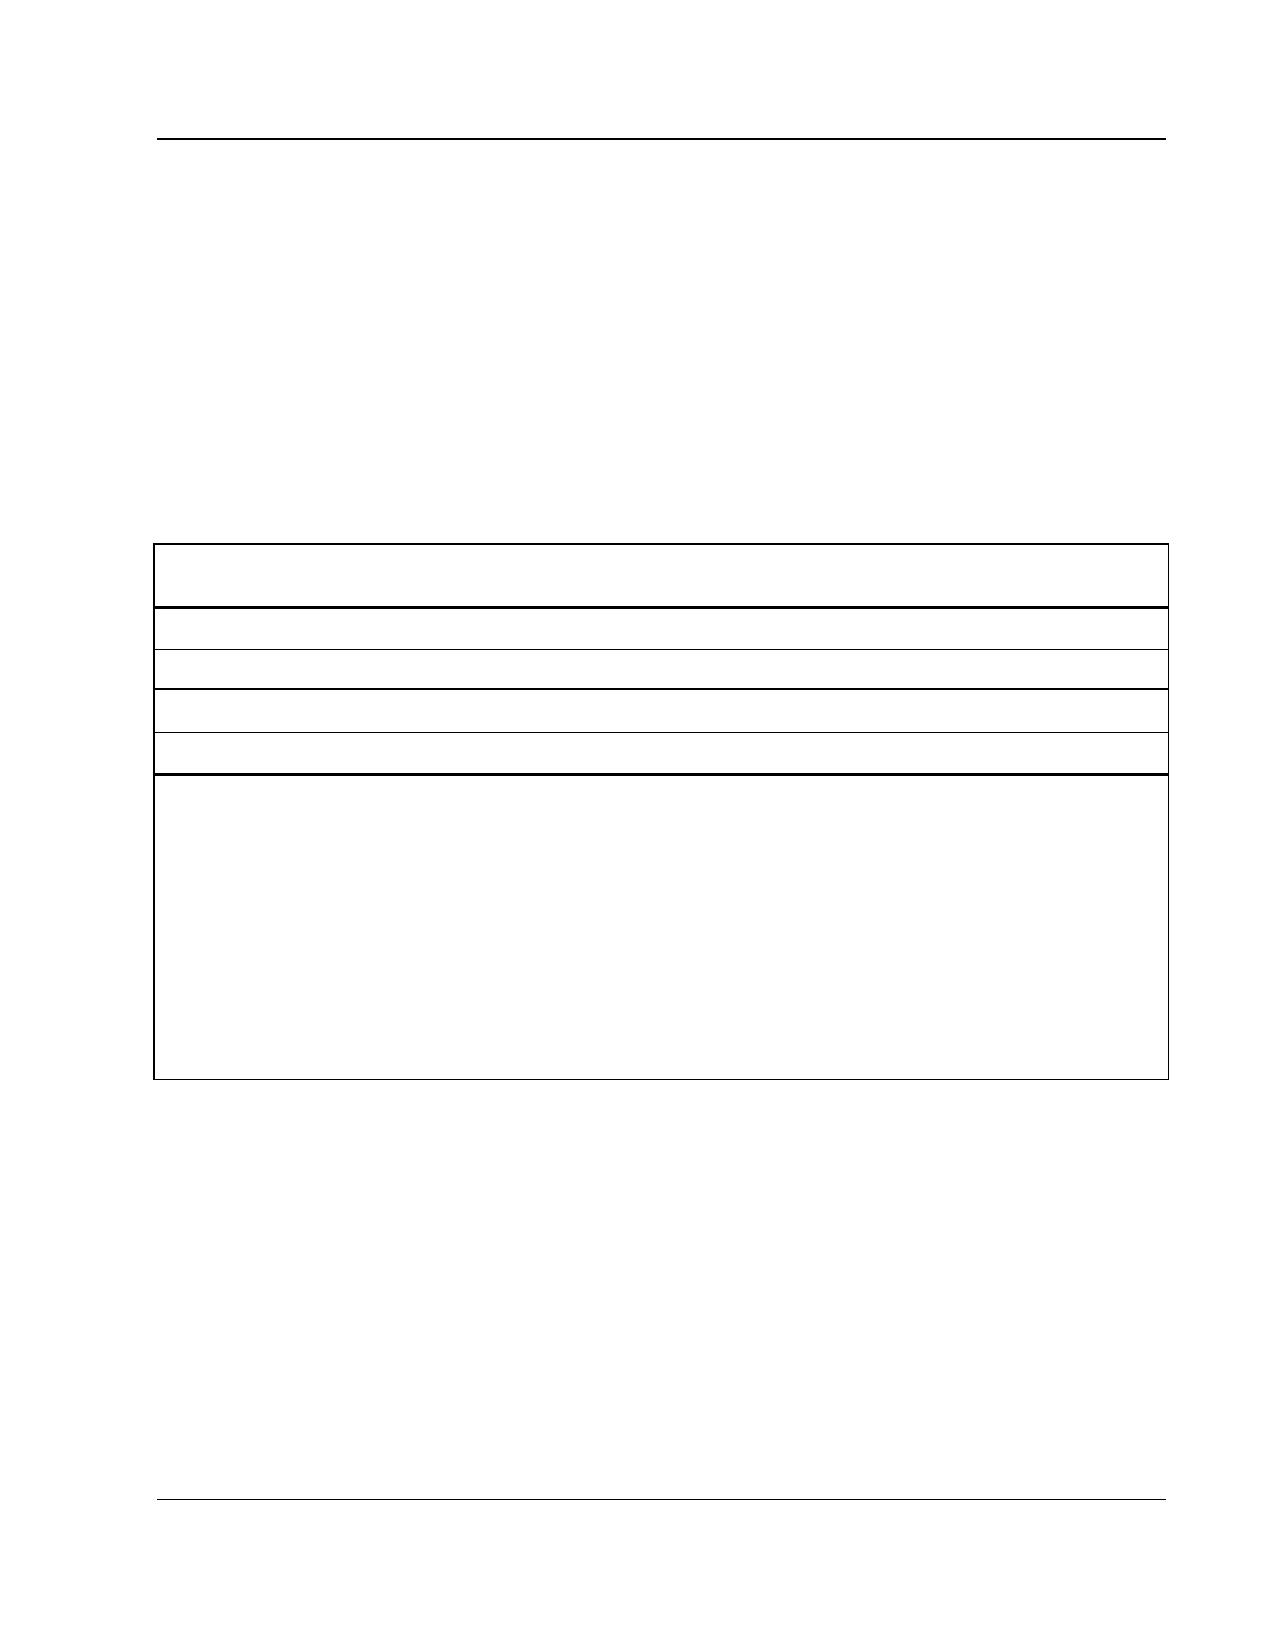 1N956 Datenblatt PDF